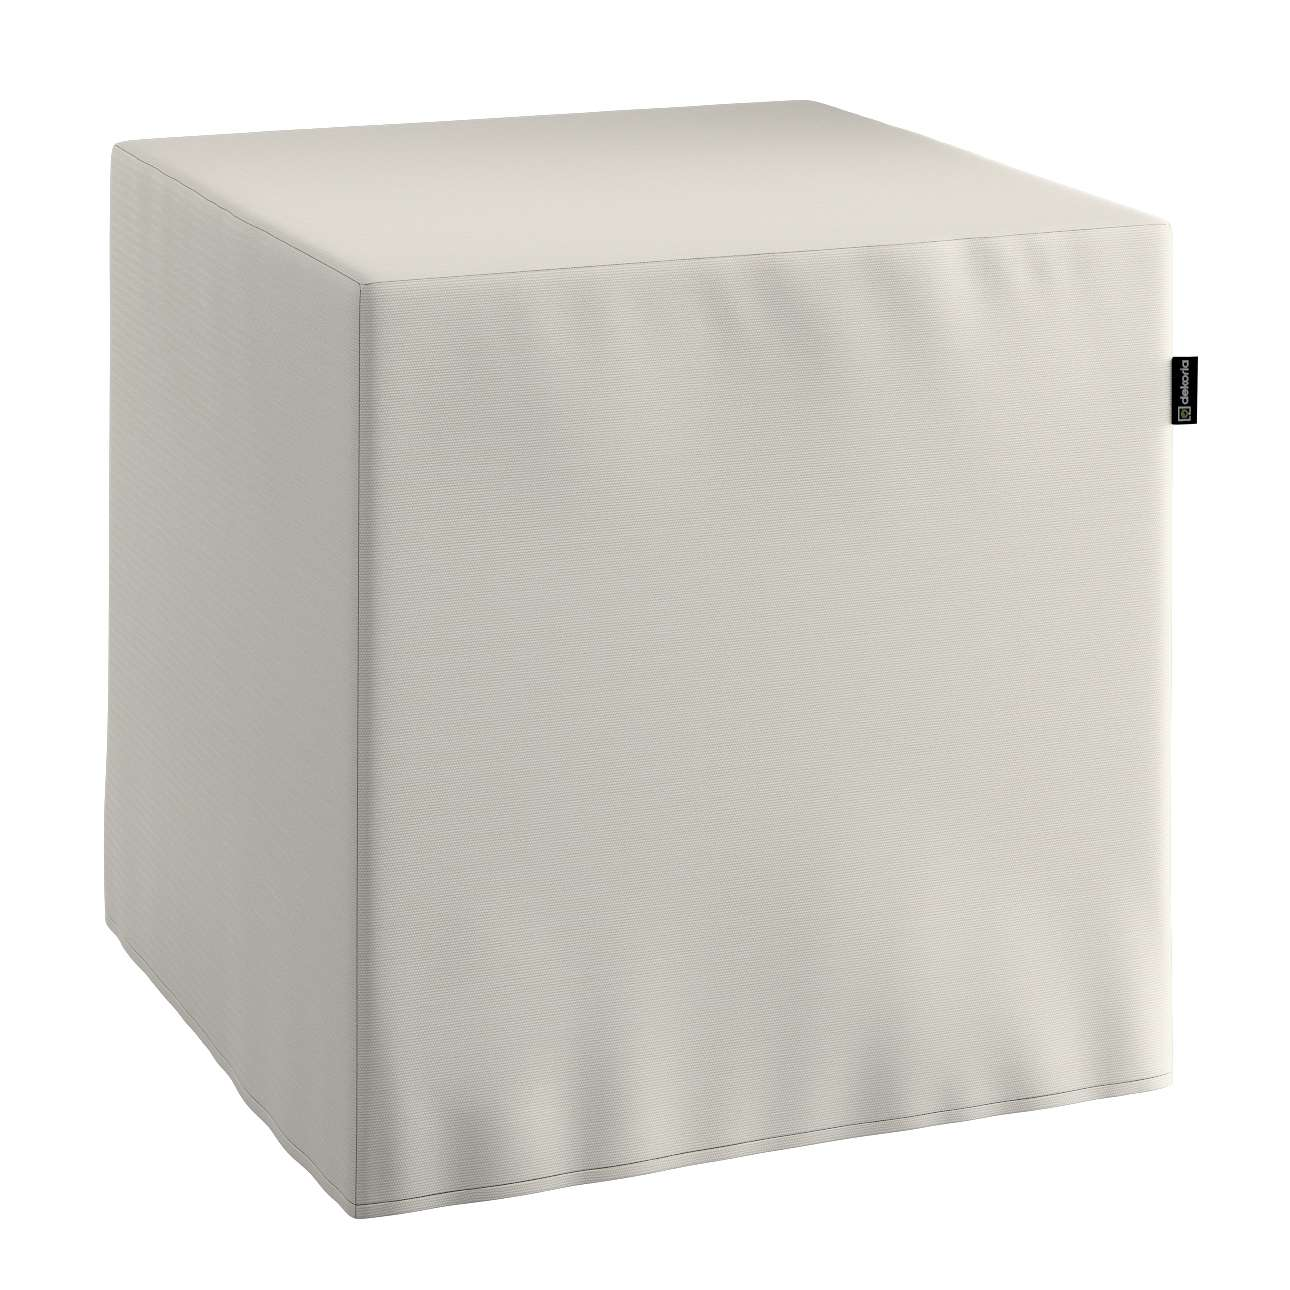 Taburetka tvrdá, kocka V kolekcii Cotton Panama, tkanina: 702-31